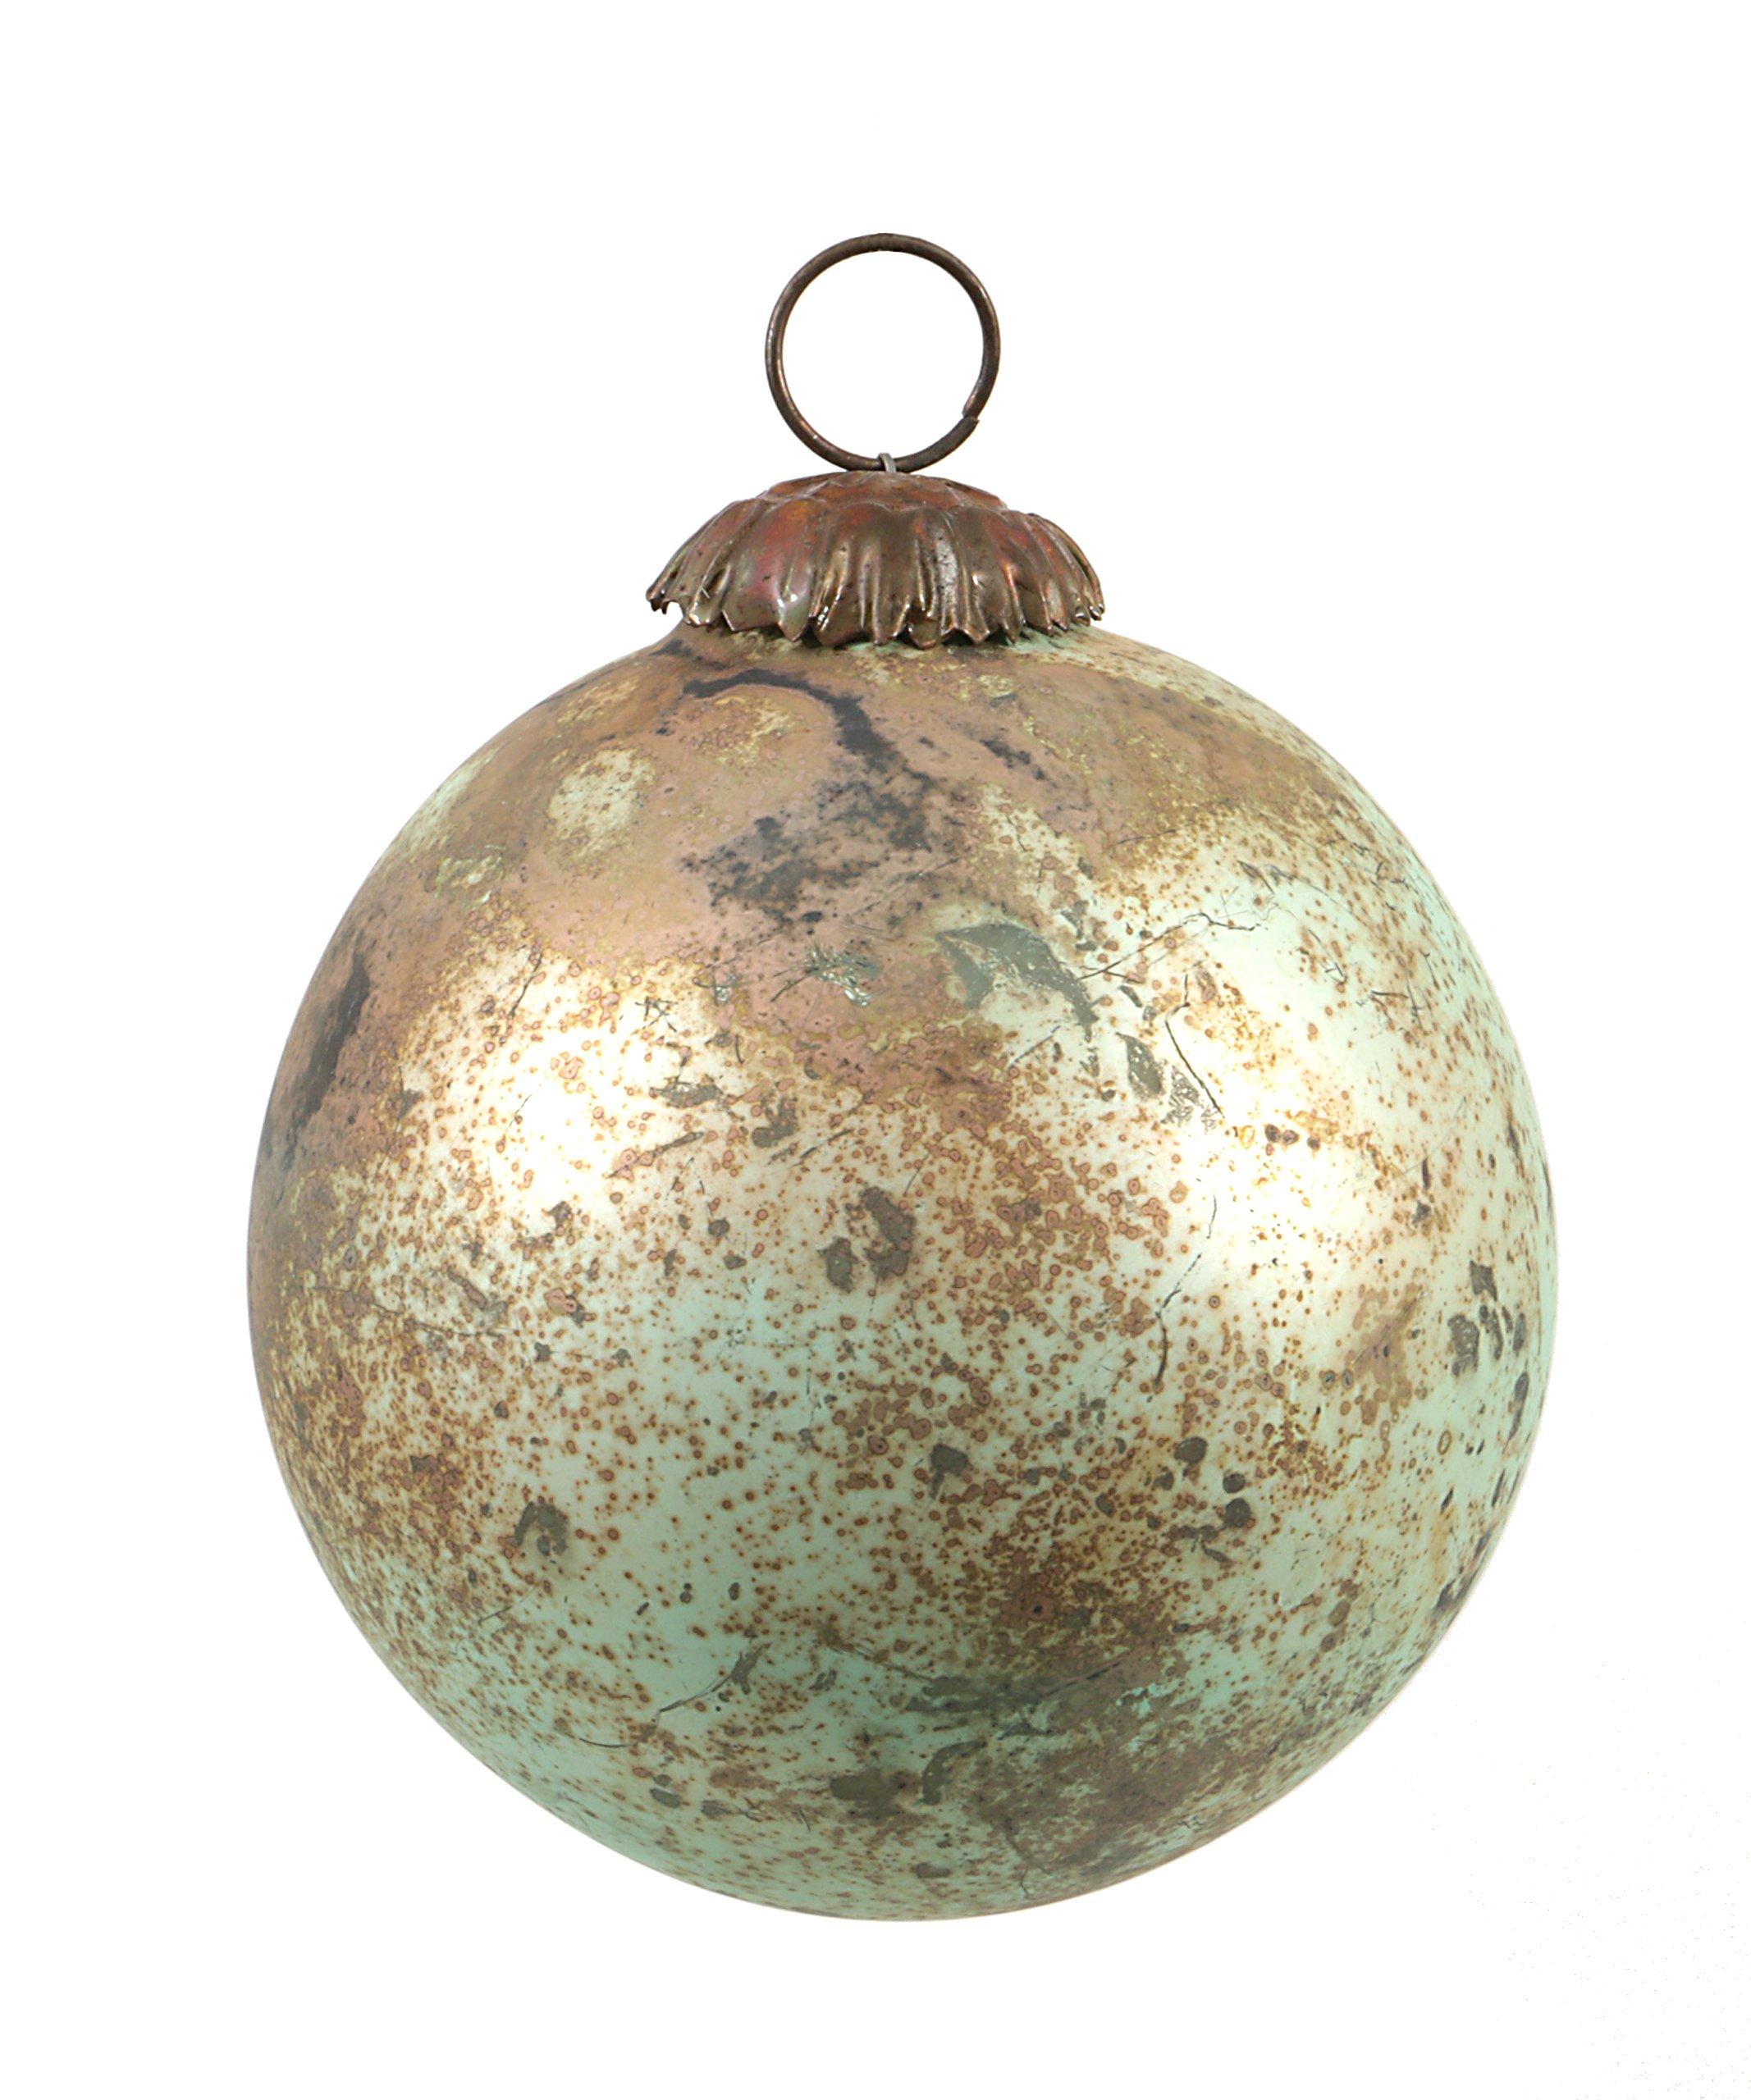 Creative Co-op 4'' Round Glass Marble Design Ornament, Copper